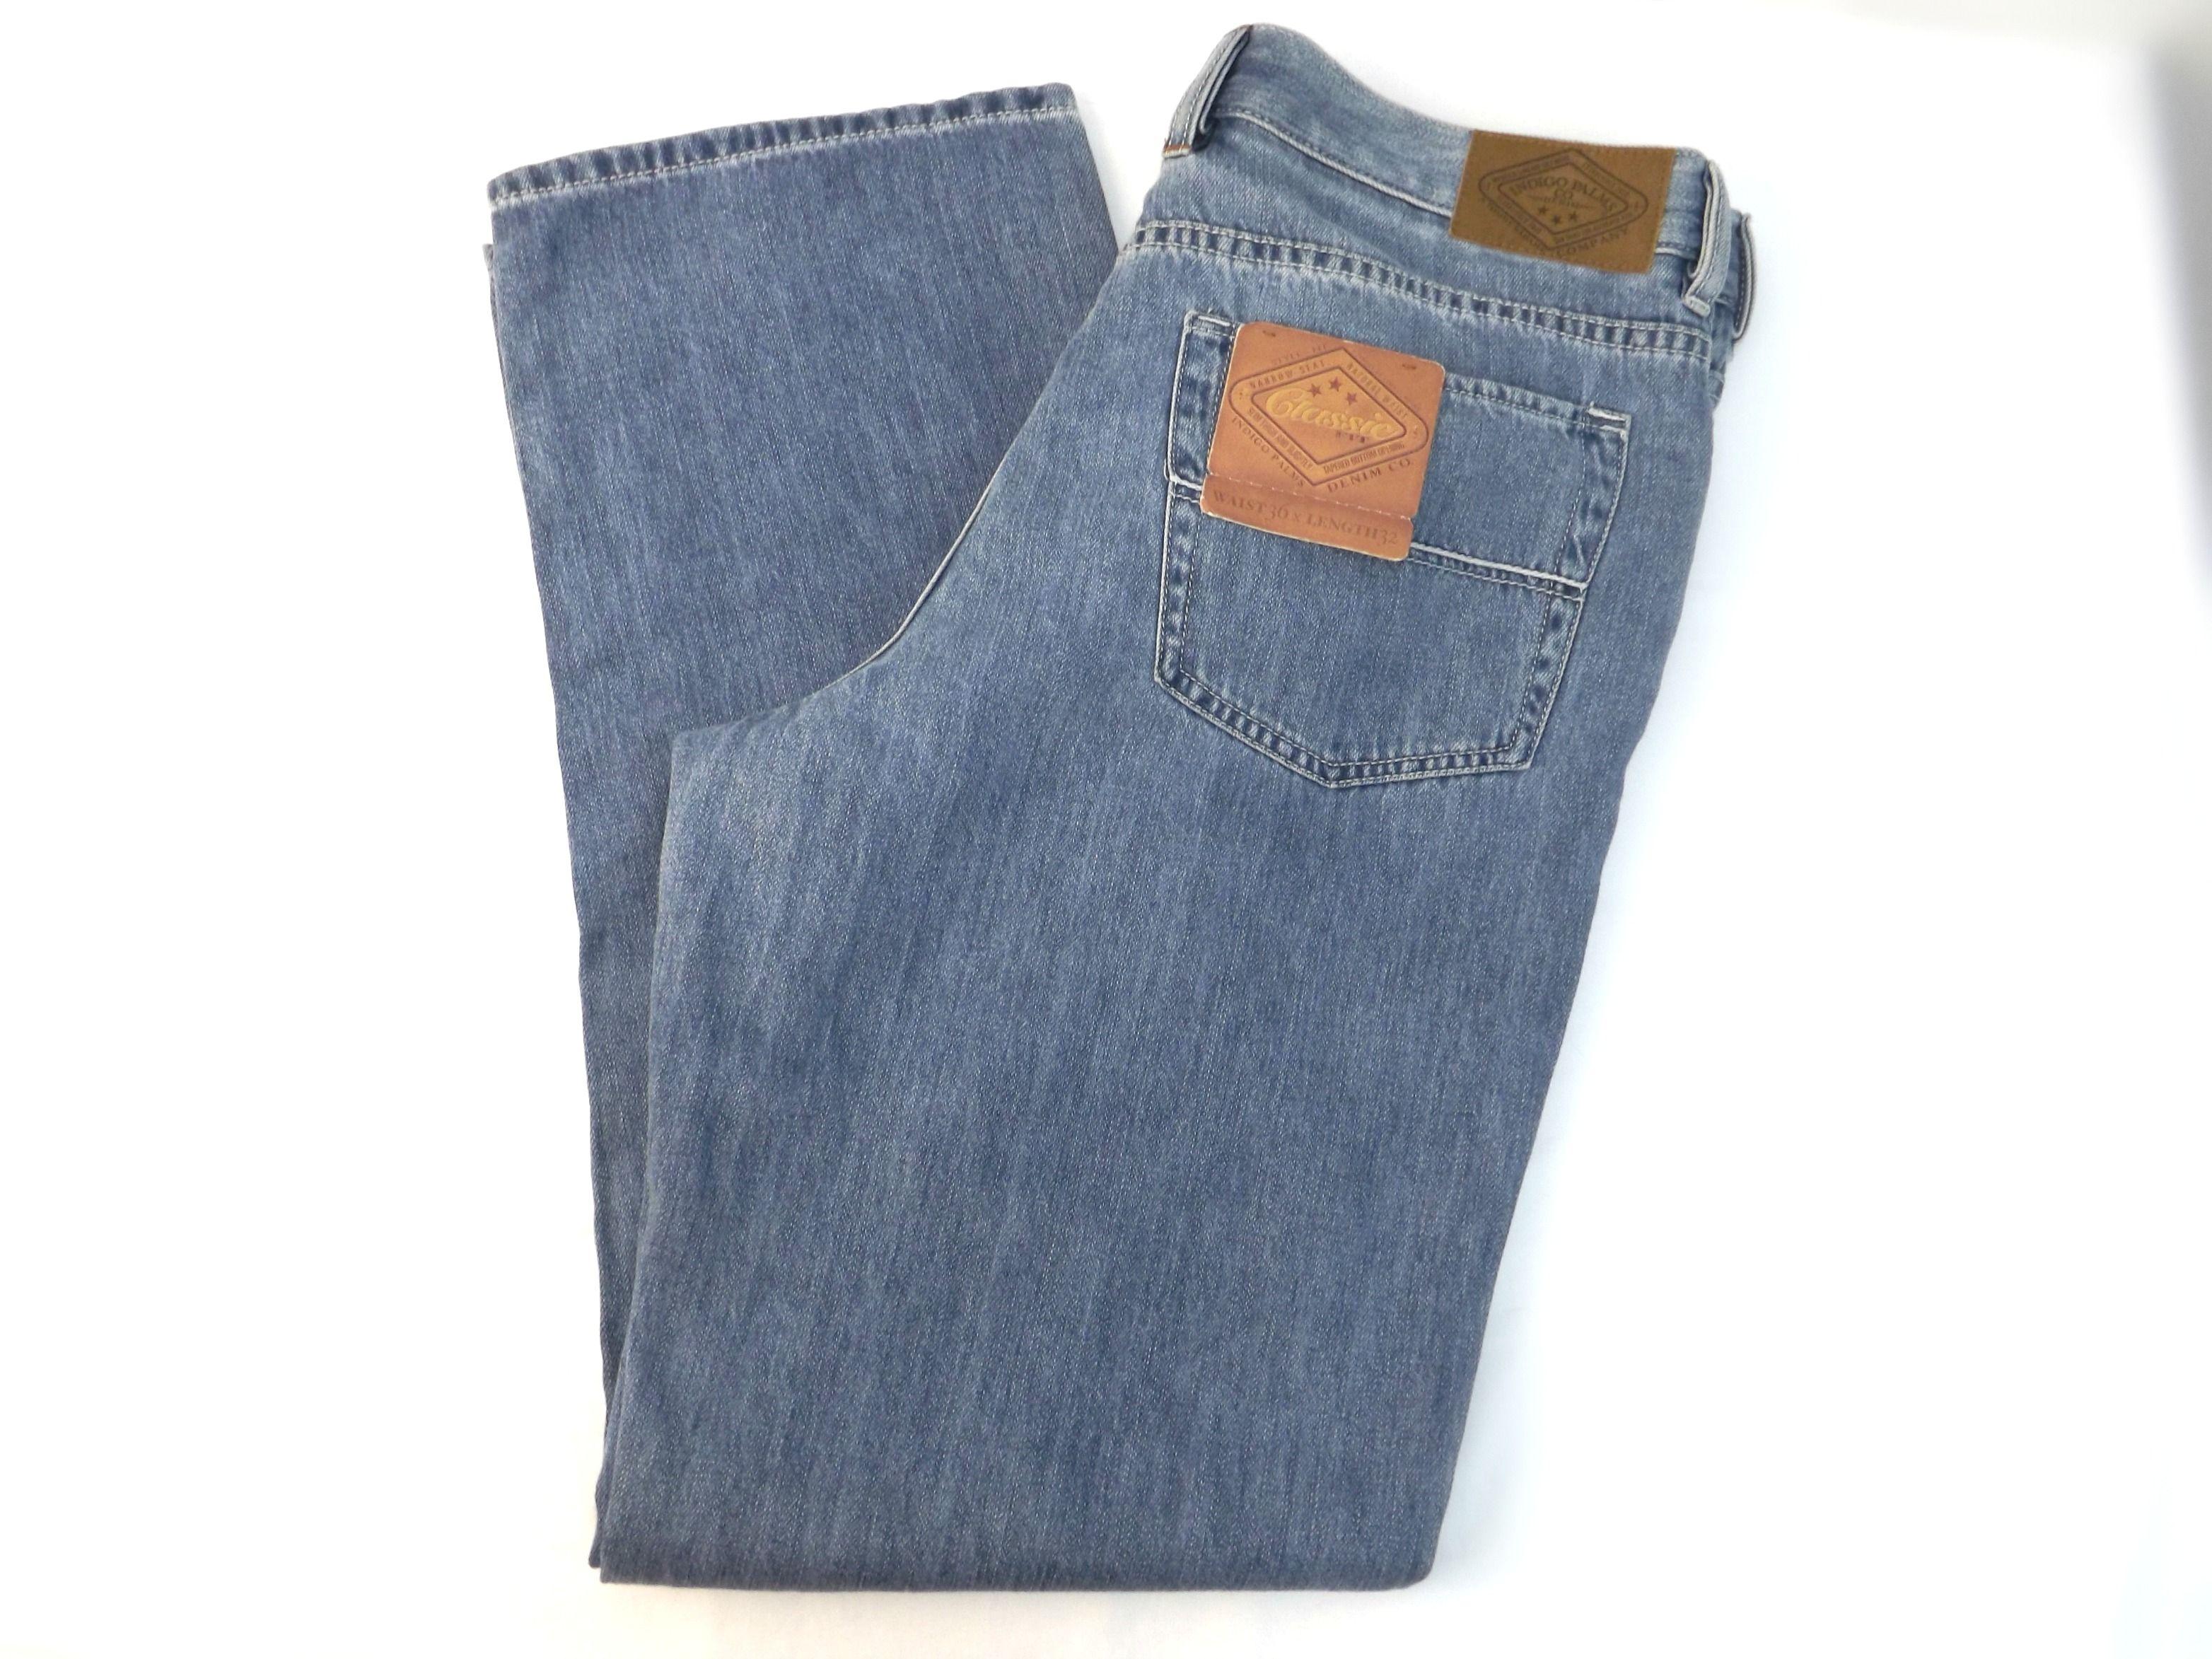 f6607d1c TOMMY BAHAMA Indigo Palms Classic Fit Jeans Size 36 X 32 Blue Mens Jeans New